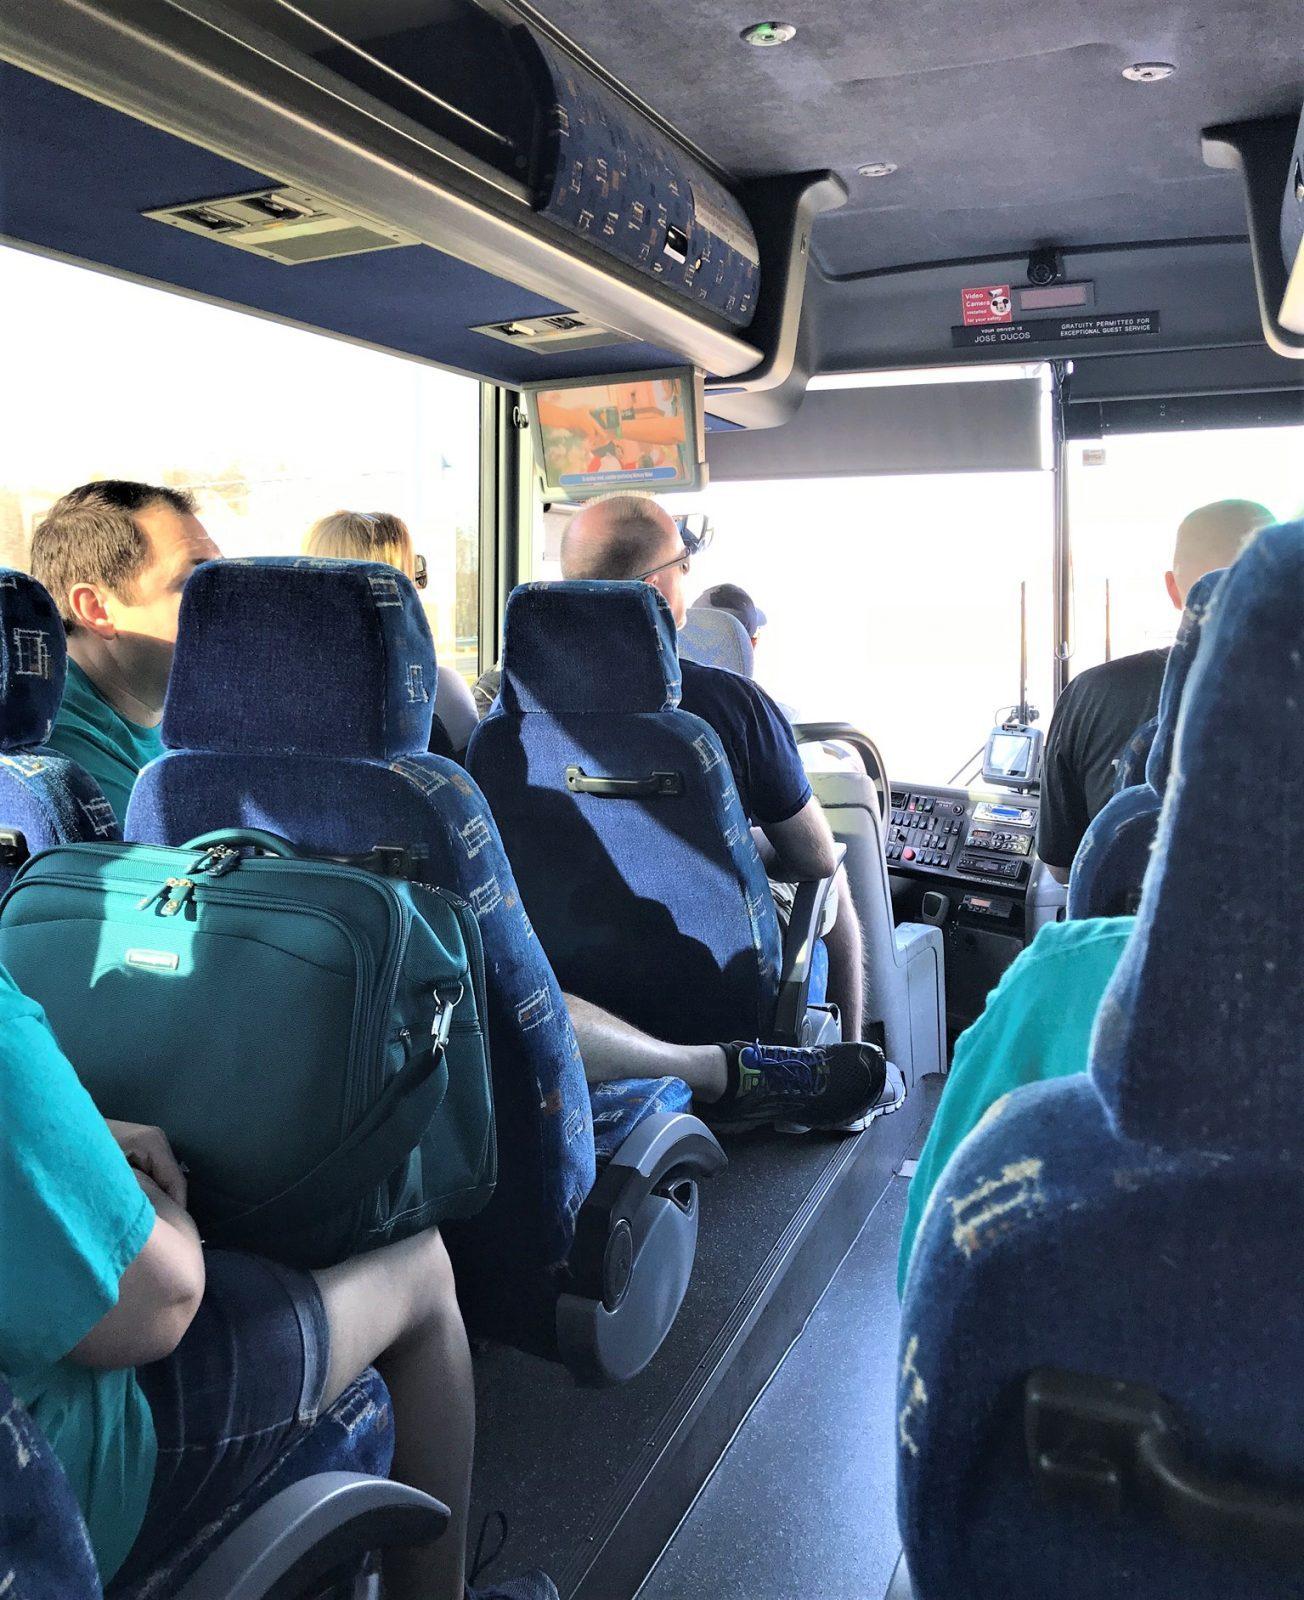 interior of magical express bus